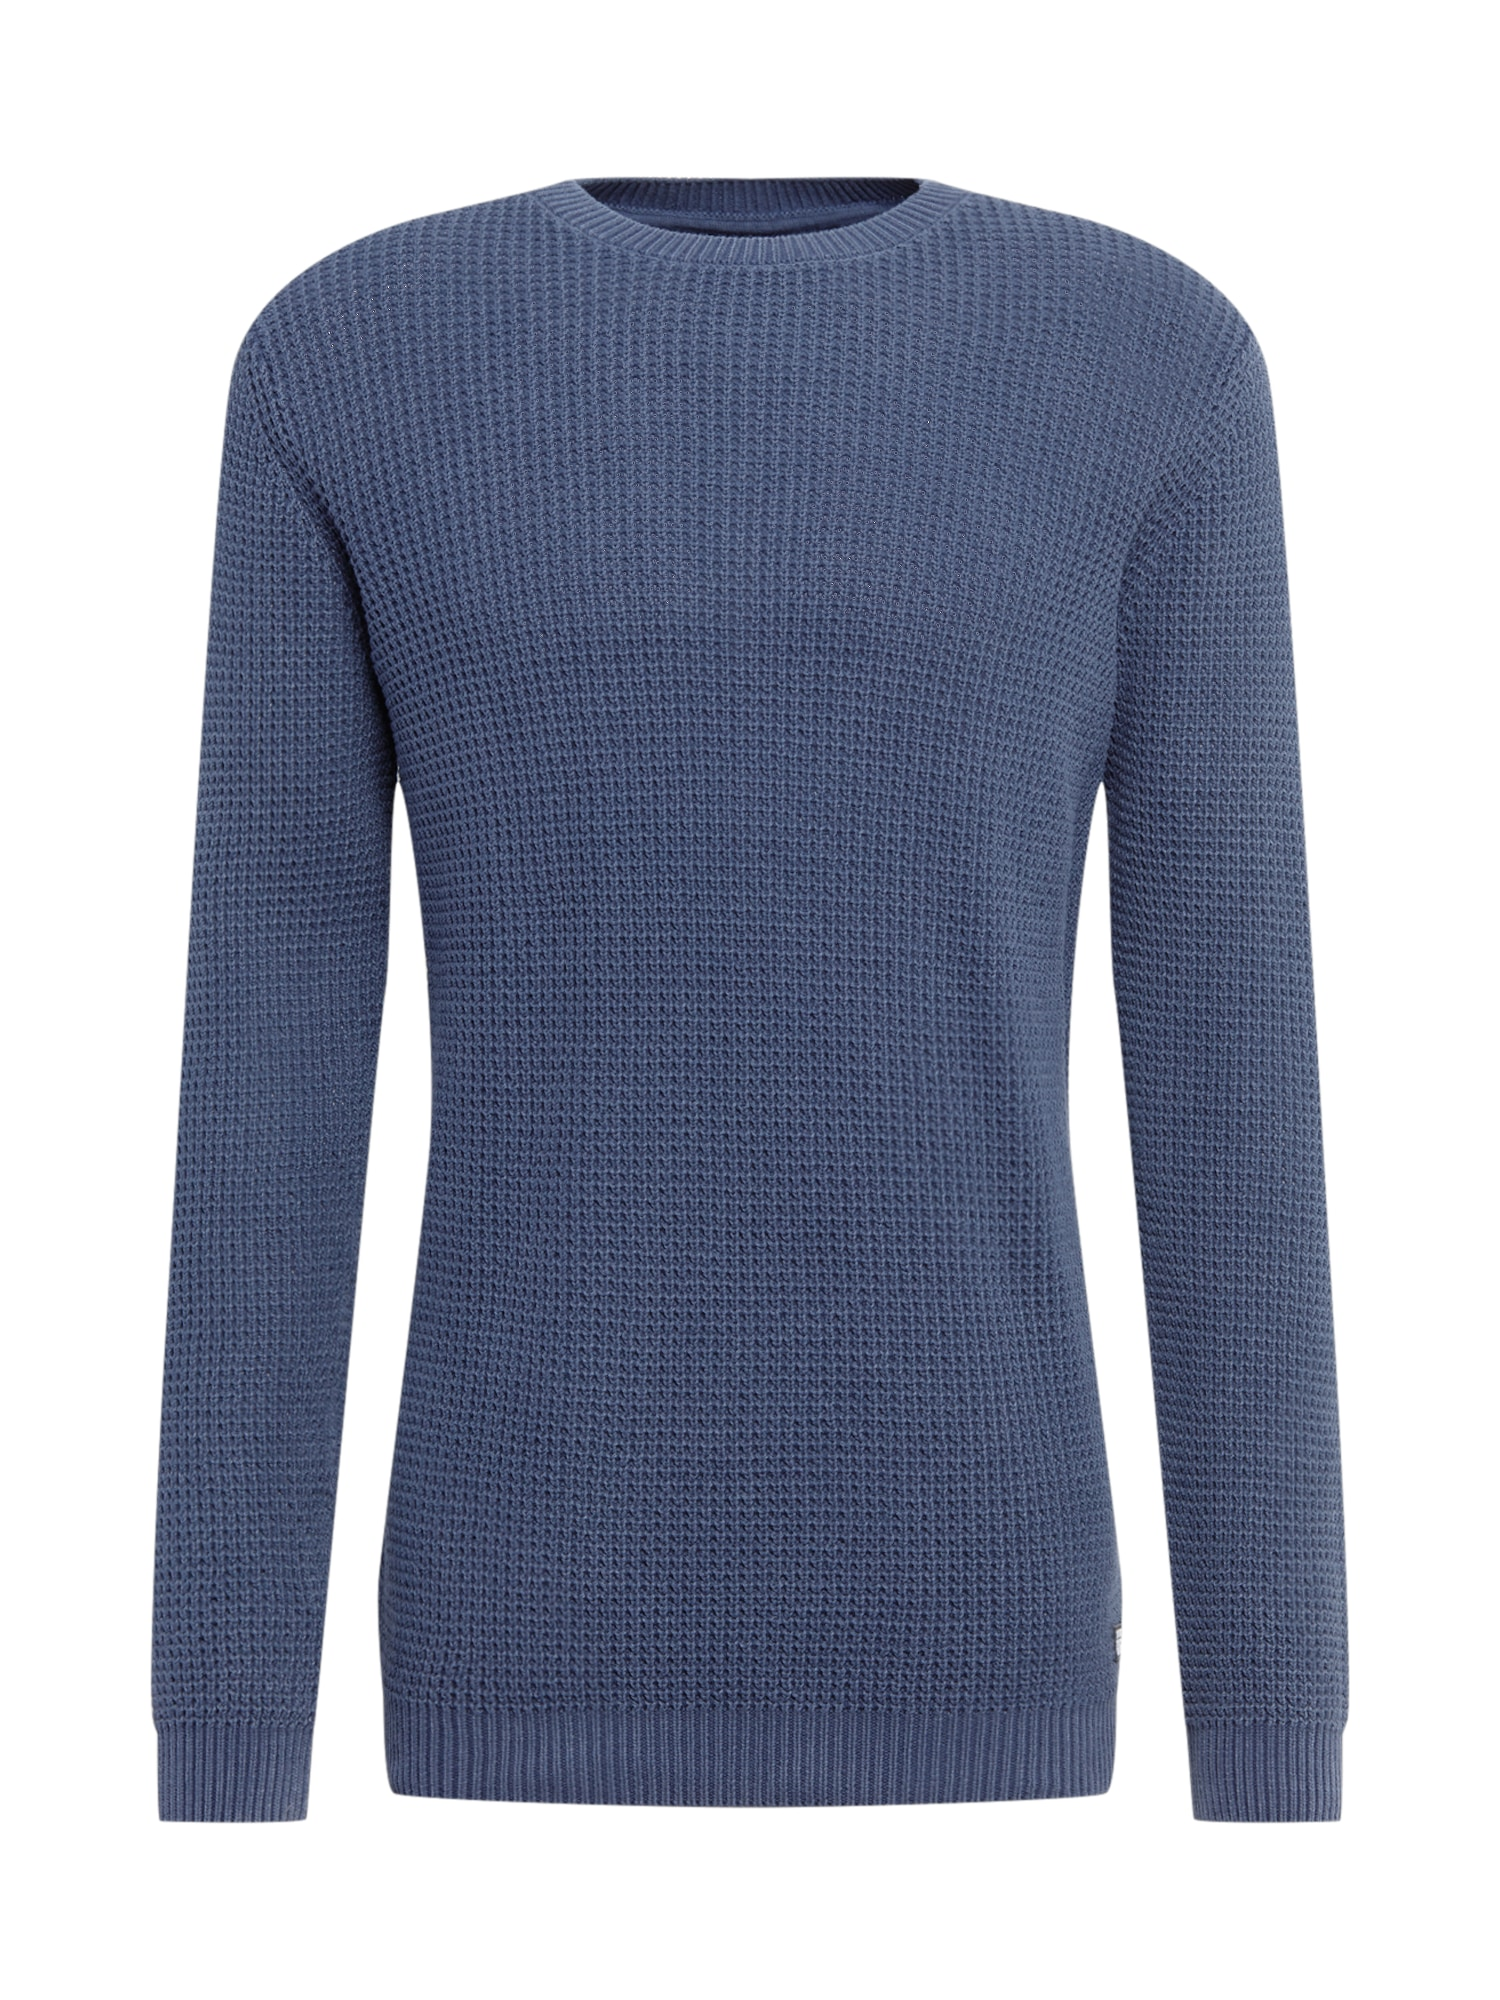 Cars Jeans Megztinis tamsiai mėlyna